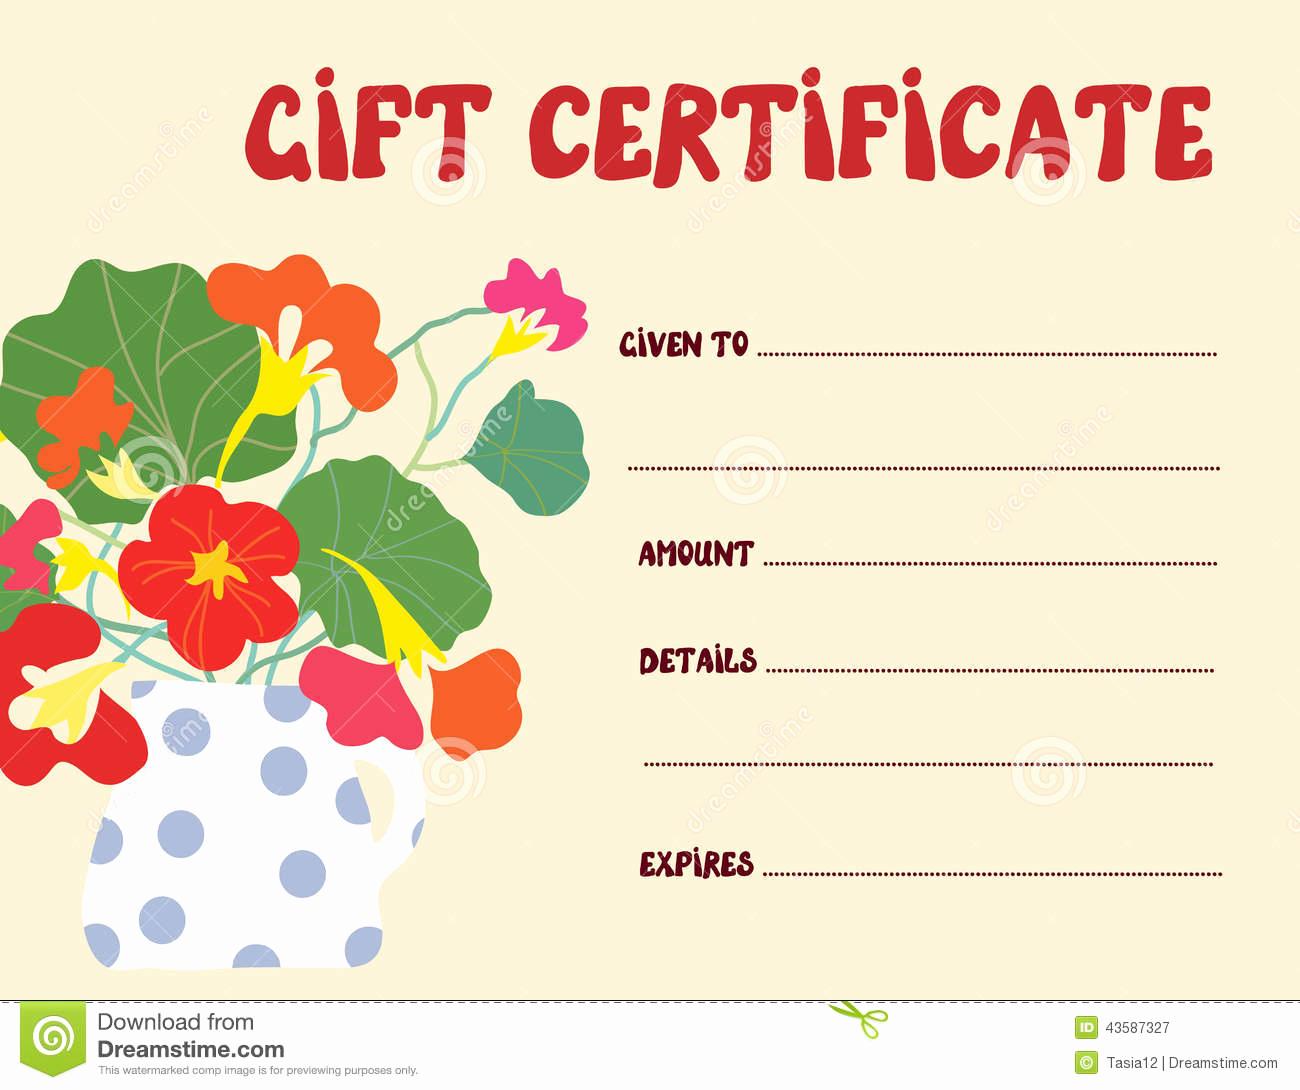 Funny Gift Certificate Template Elegant Gift Certificate Template Funny Design Stock Vector